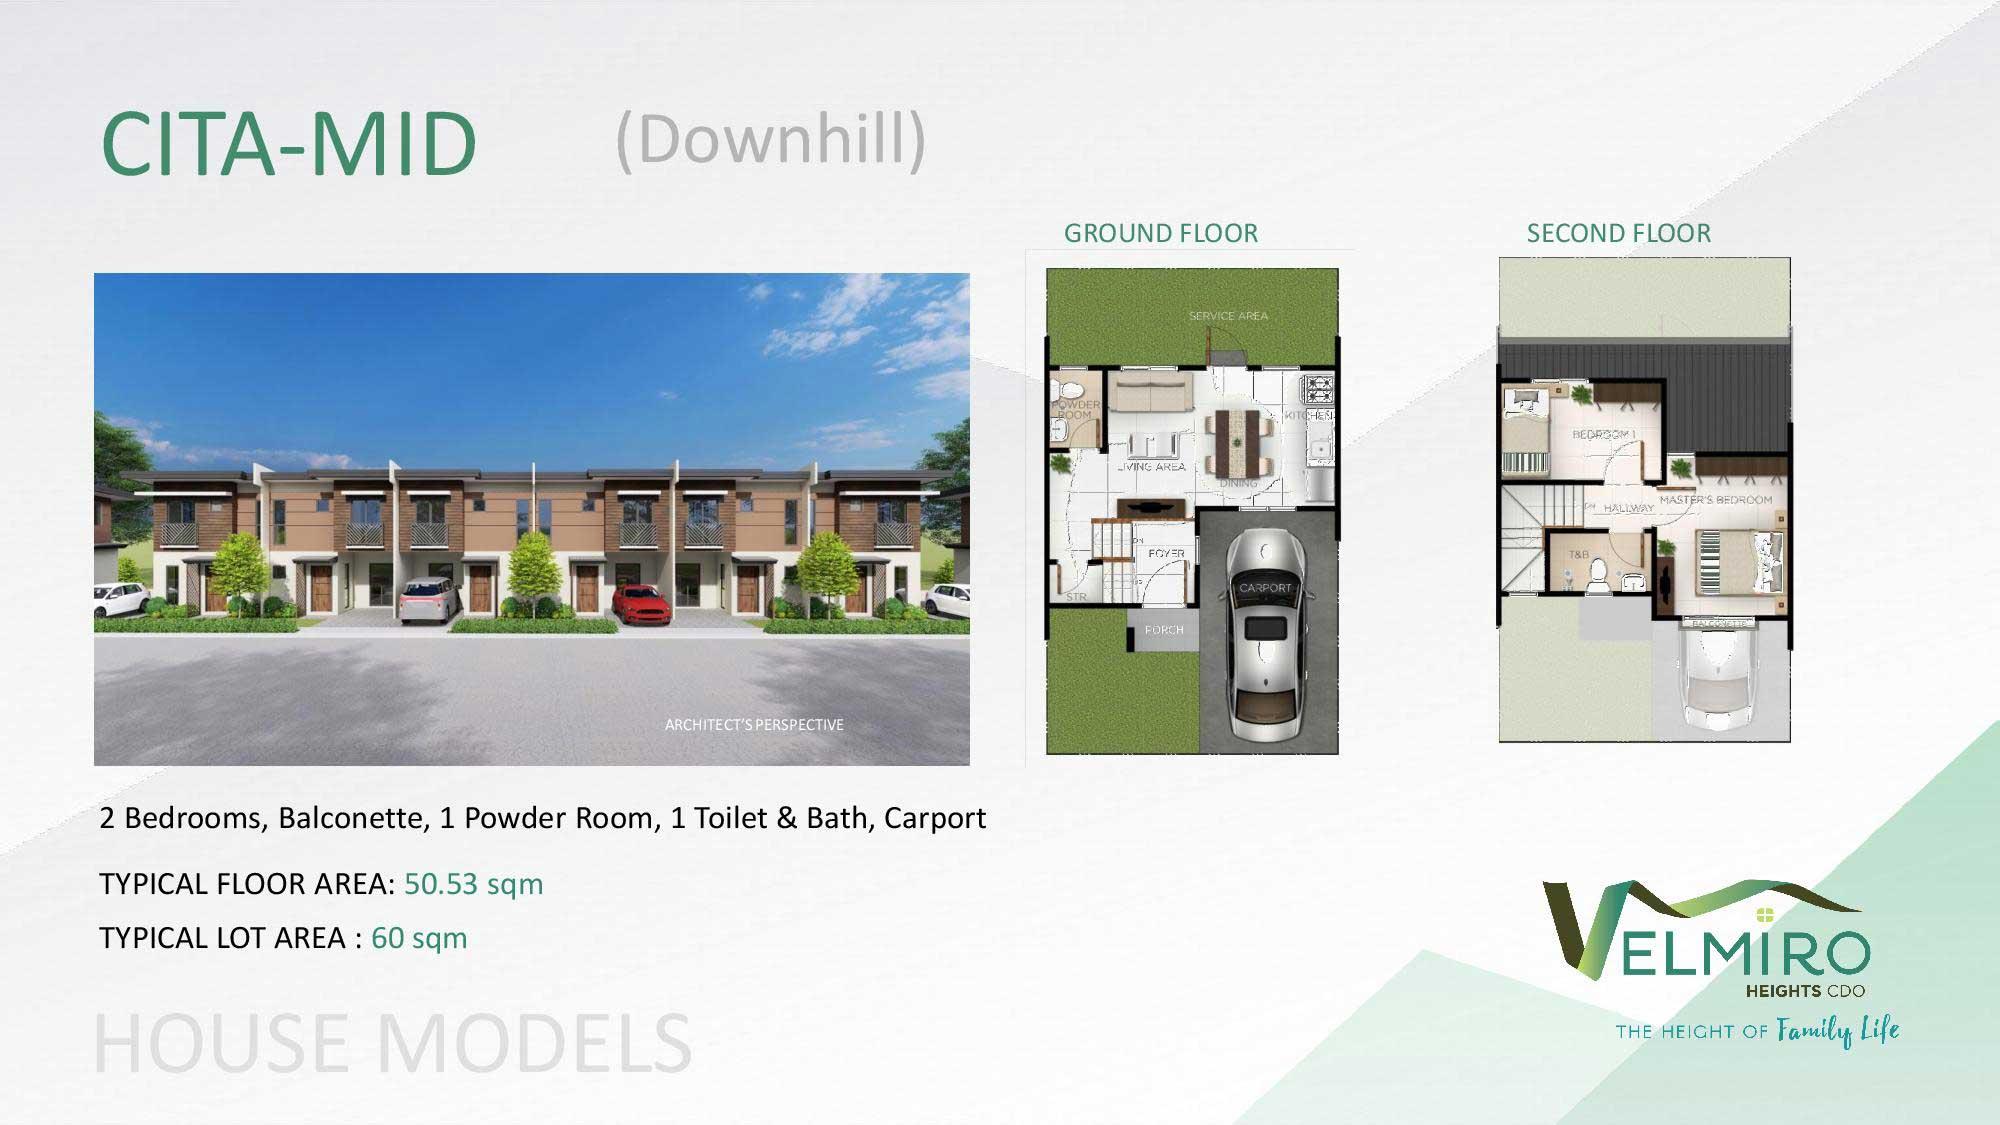 Velmiro heights agusan house model cita mid downhill web gmc